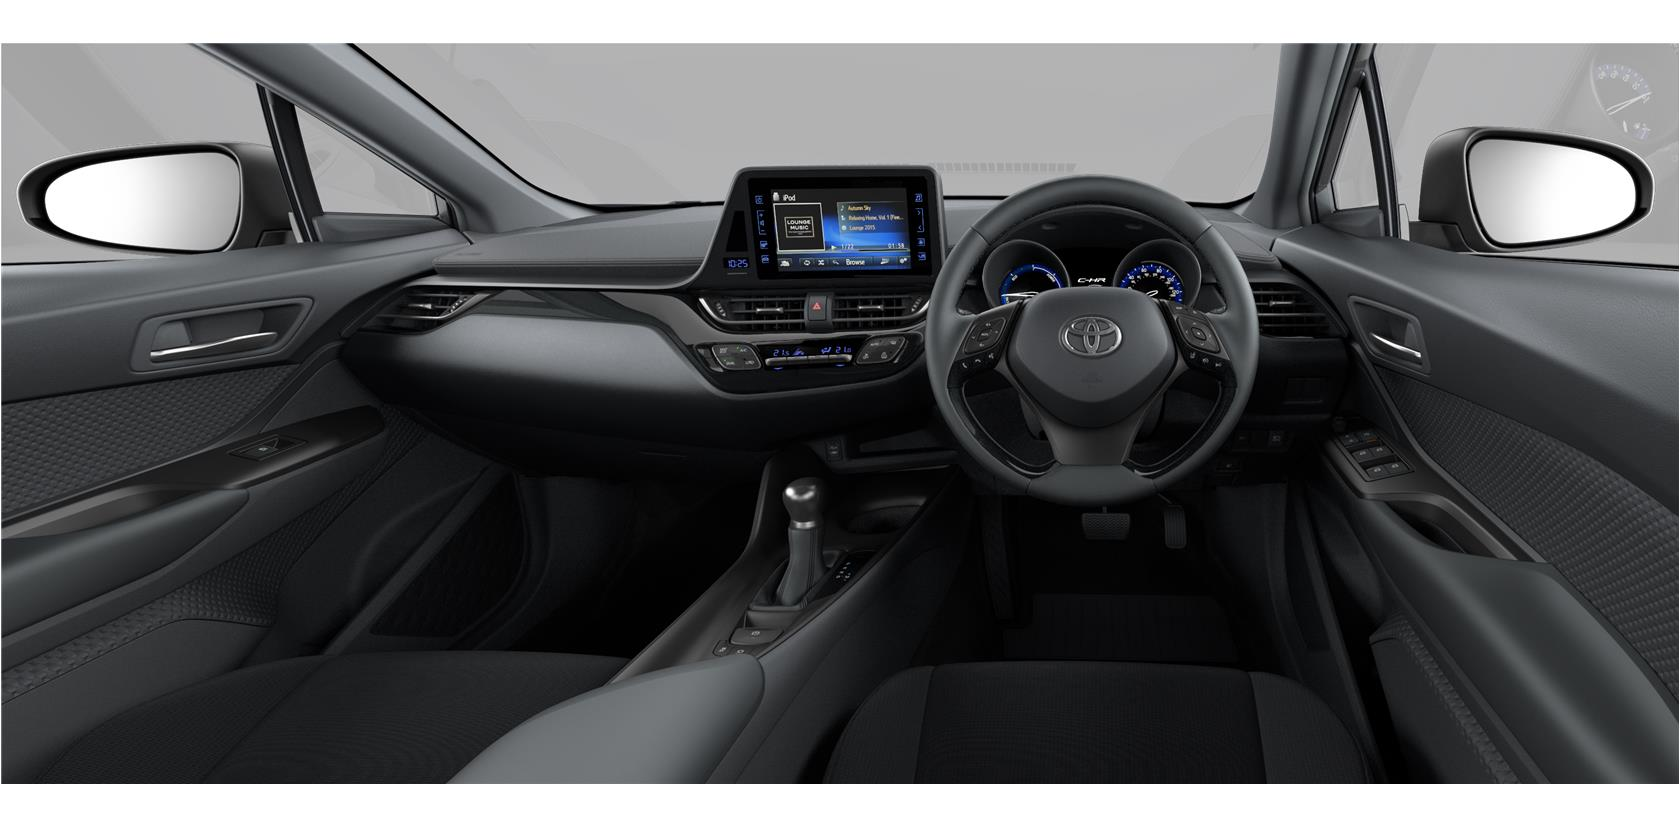 Toyota C-HR interior colors - Tax Free Car Hub Seychelles